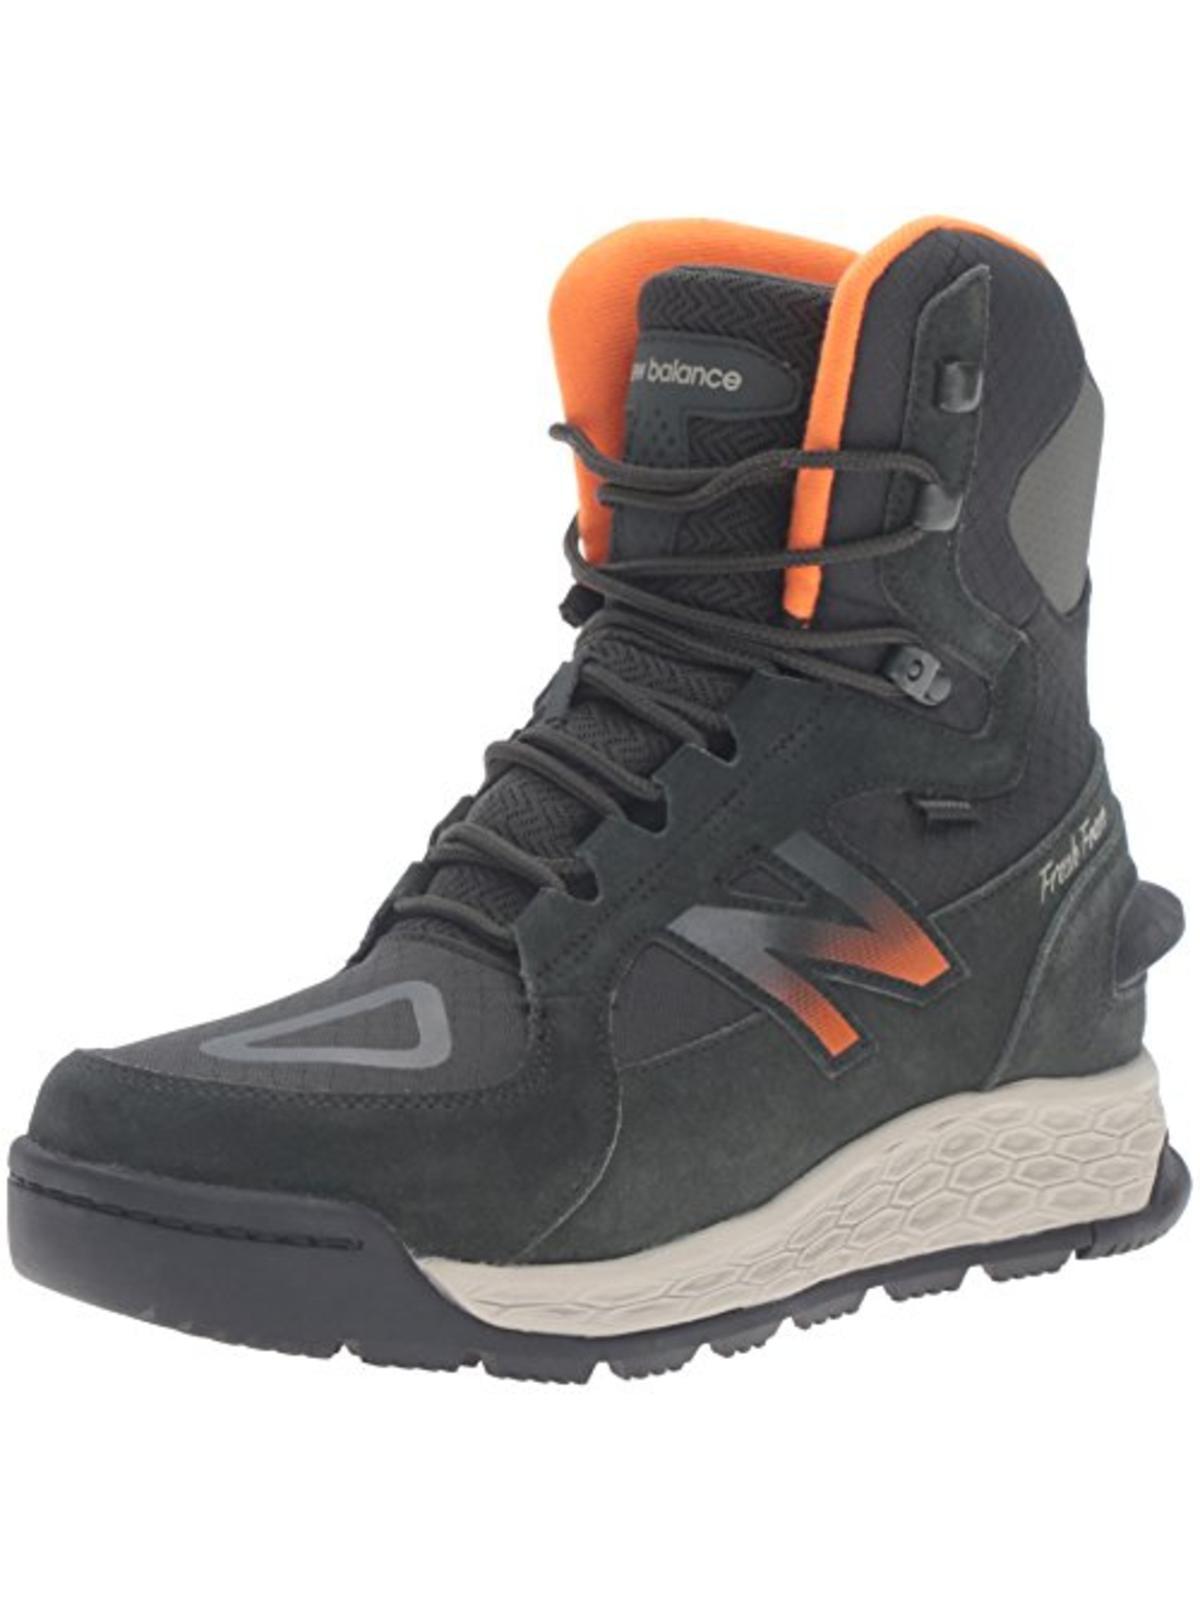 a1bcf243fa21 New Balance - New Balance Men s Fresh Foam 1000v1 Winter Boot - Walmart.com